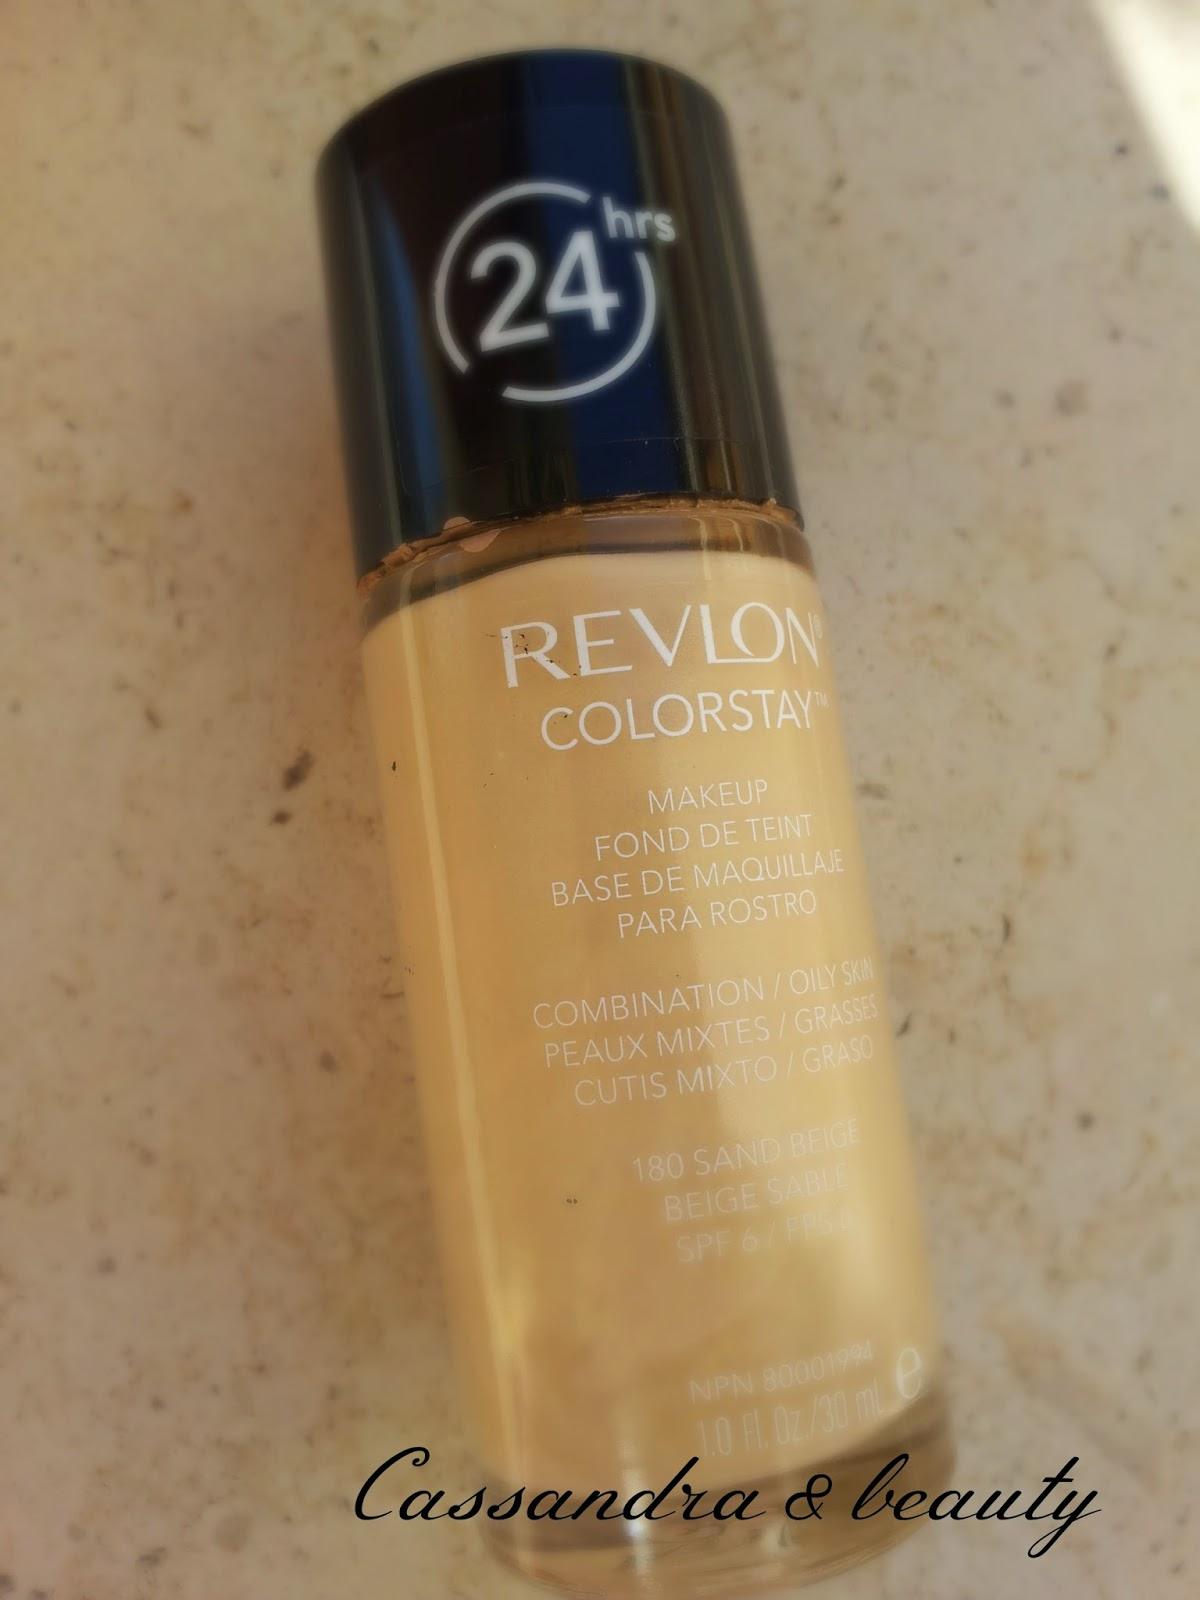 Fondotinta Revlon Colorstay per pelli miste/ 180 Sand Beige: swatch e recensione